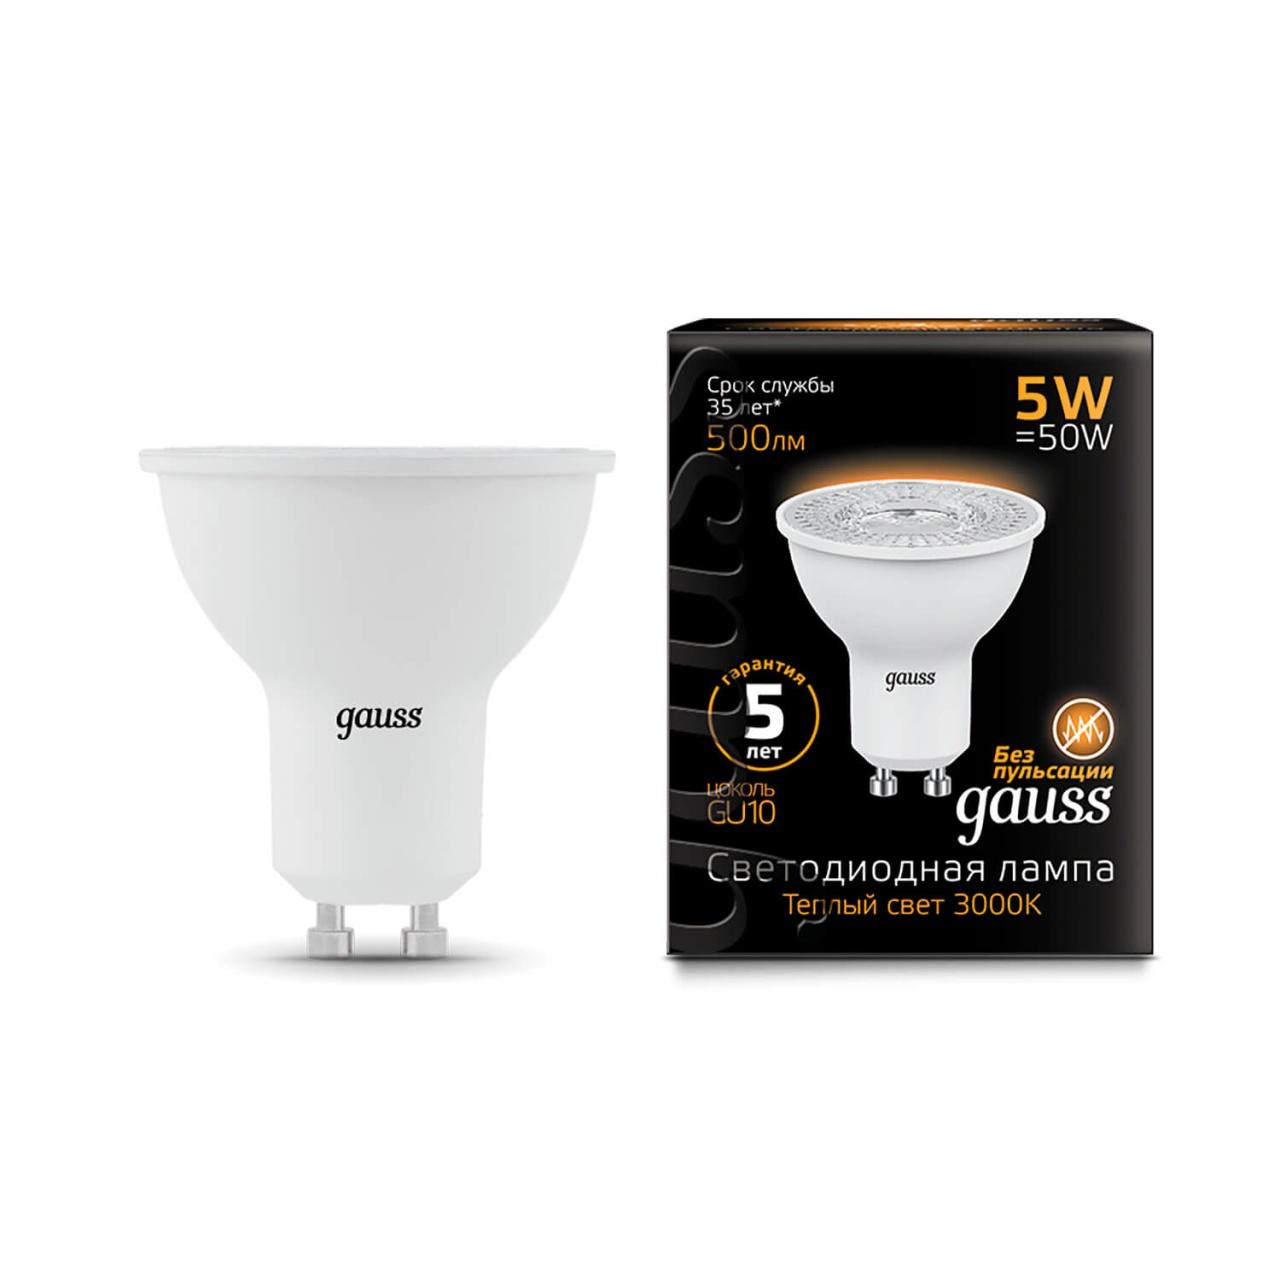 Лампа светодиодная Gauss GU10 5W 2700K матовая 101506105 цена 2017